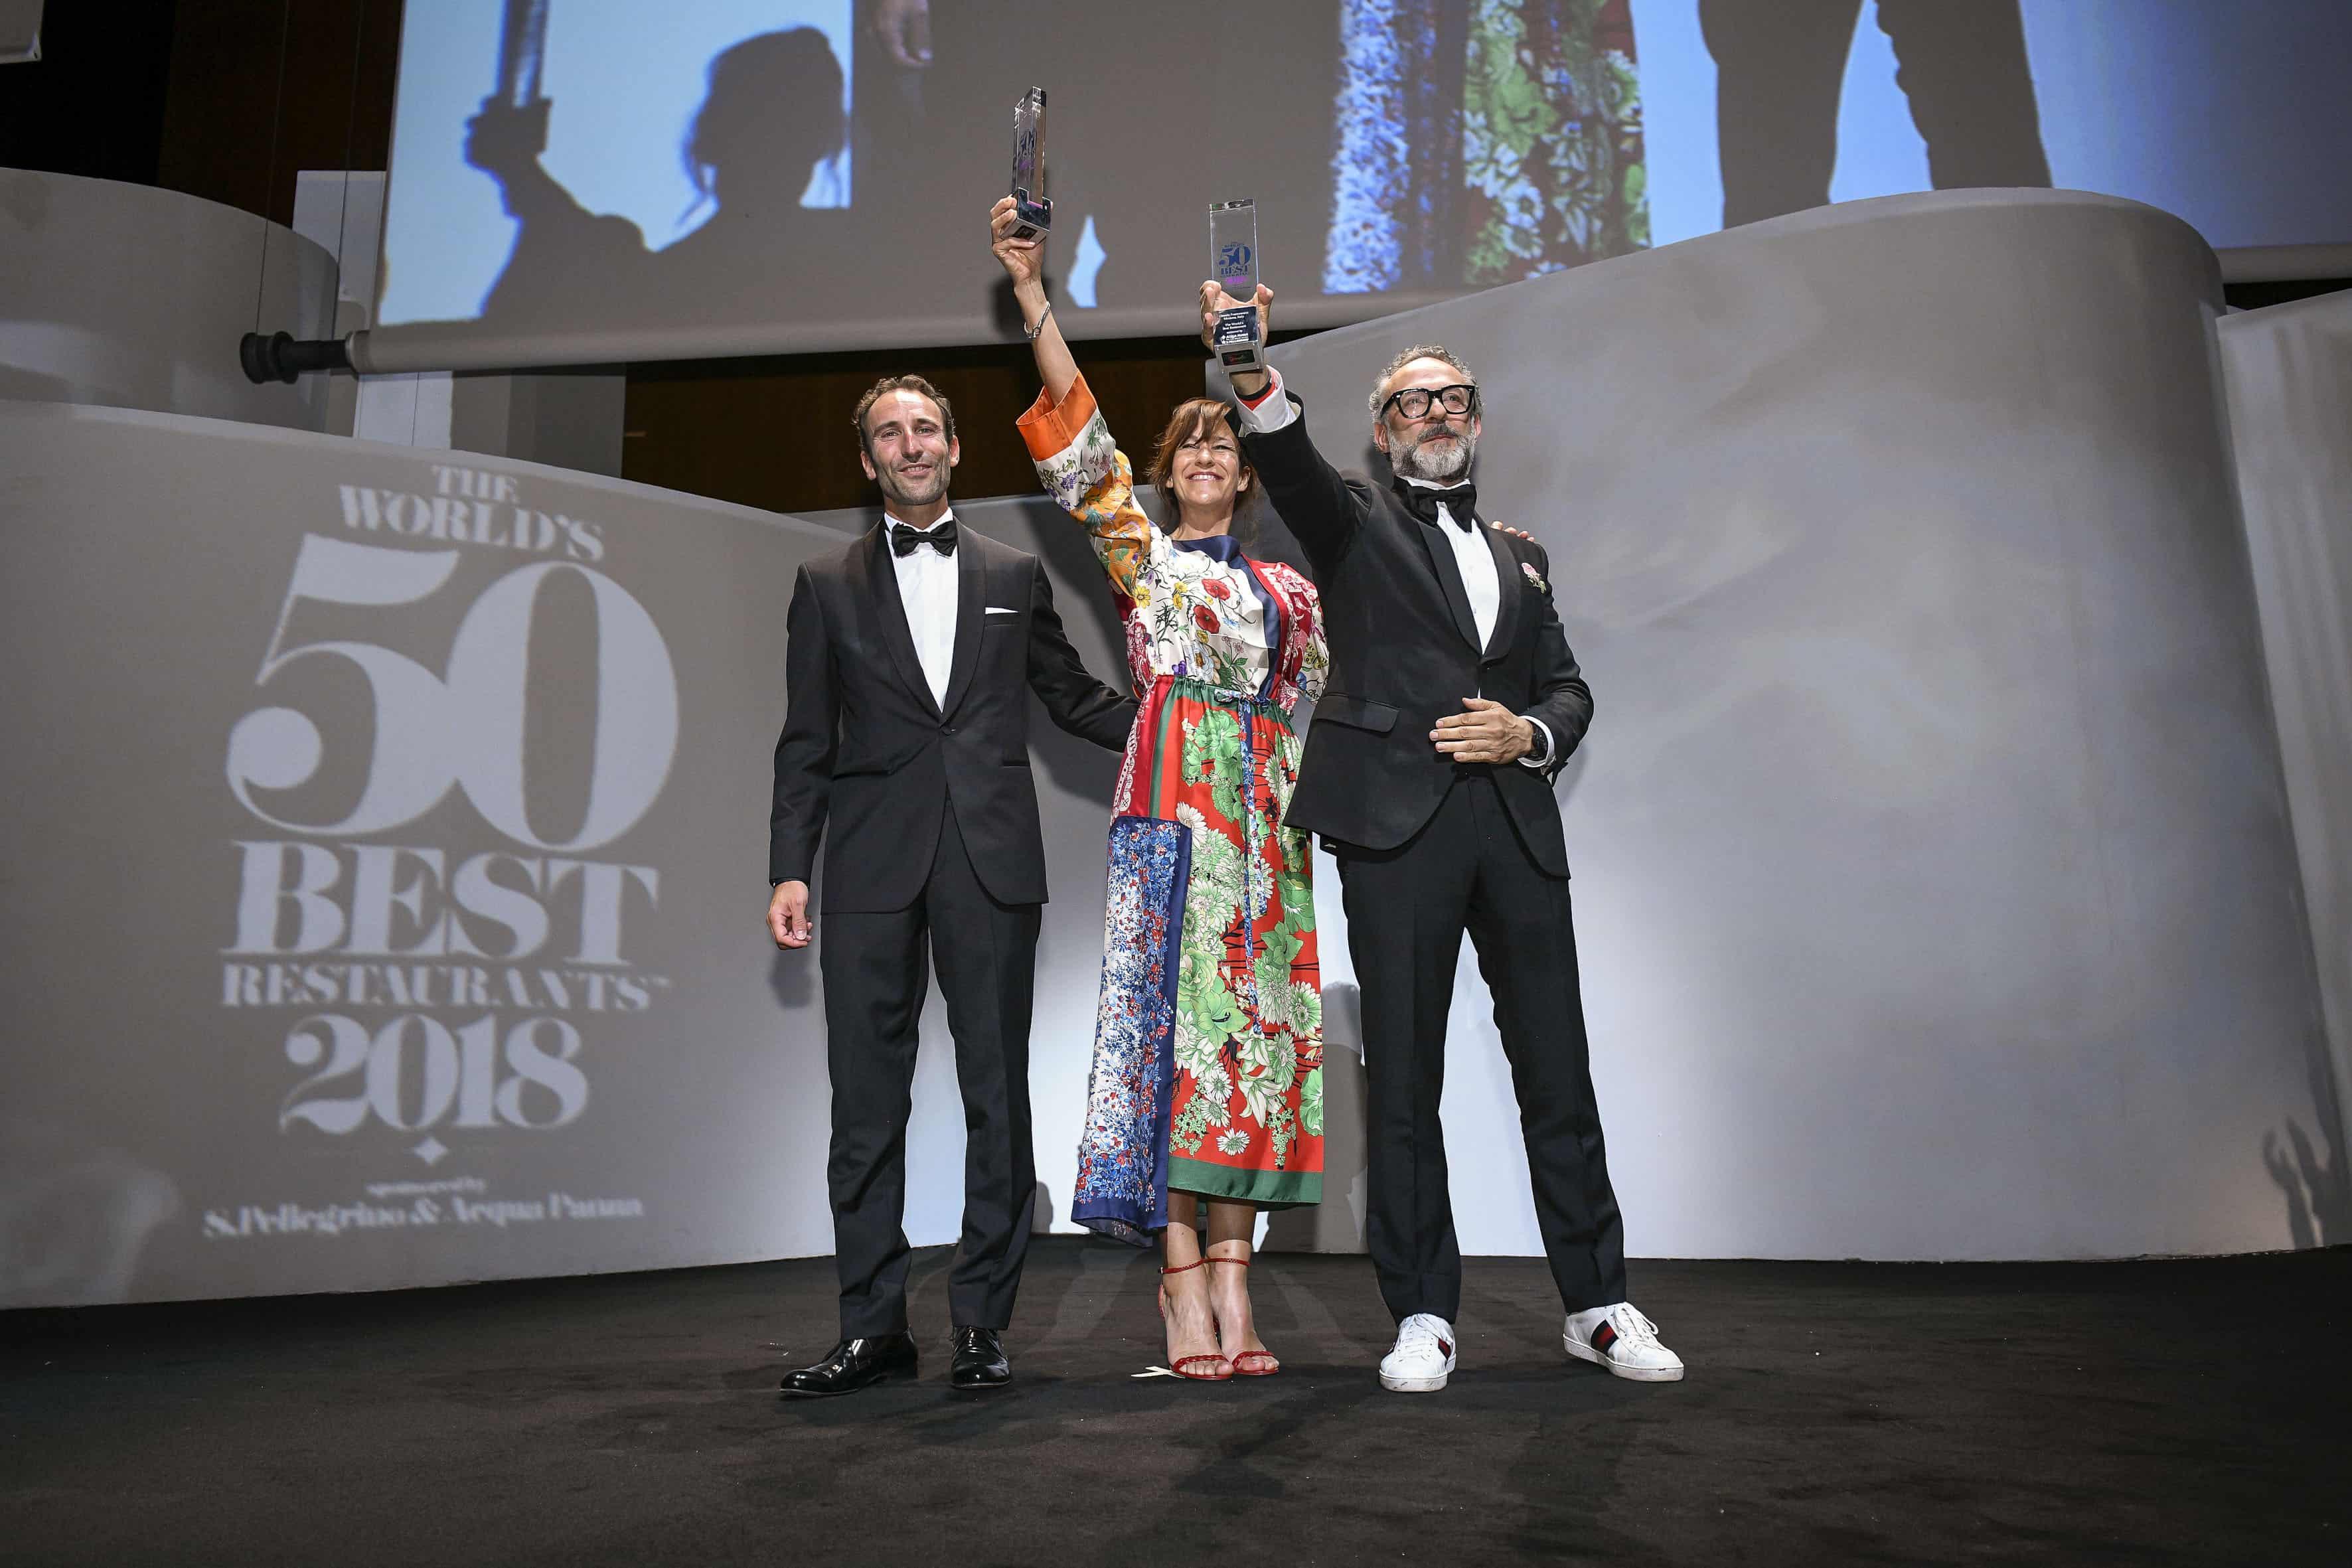 50 Best Restaurants 2018